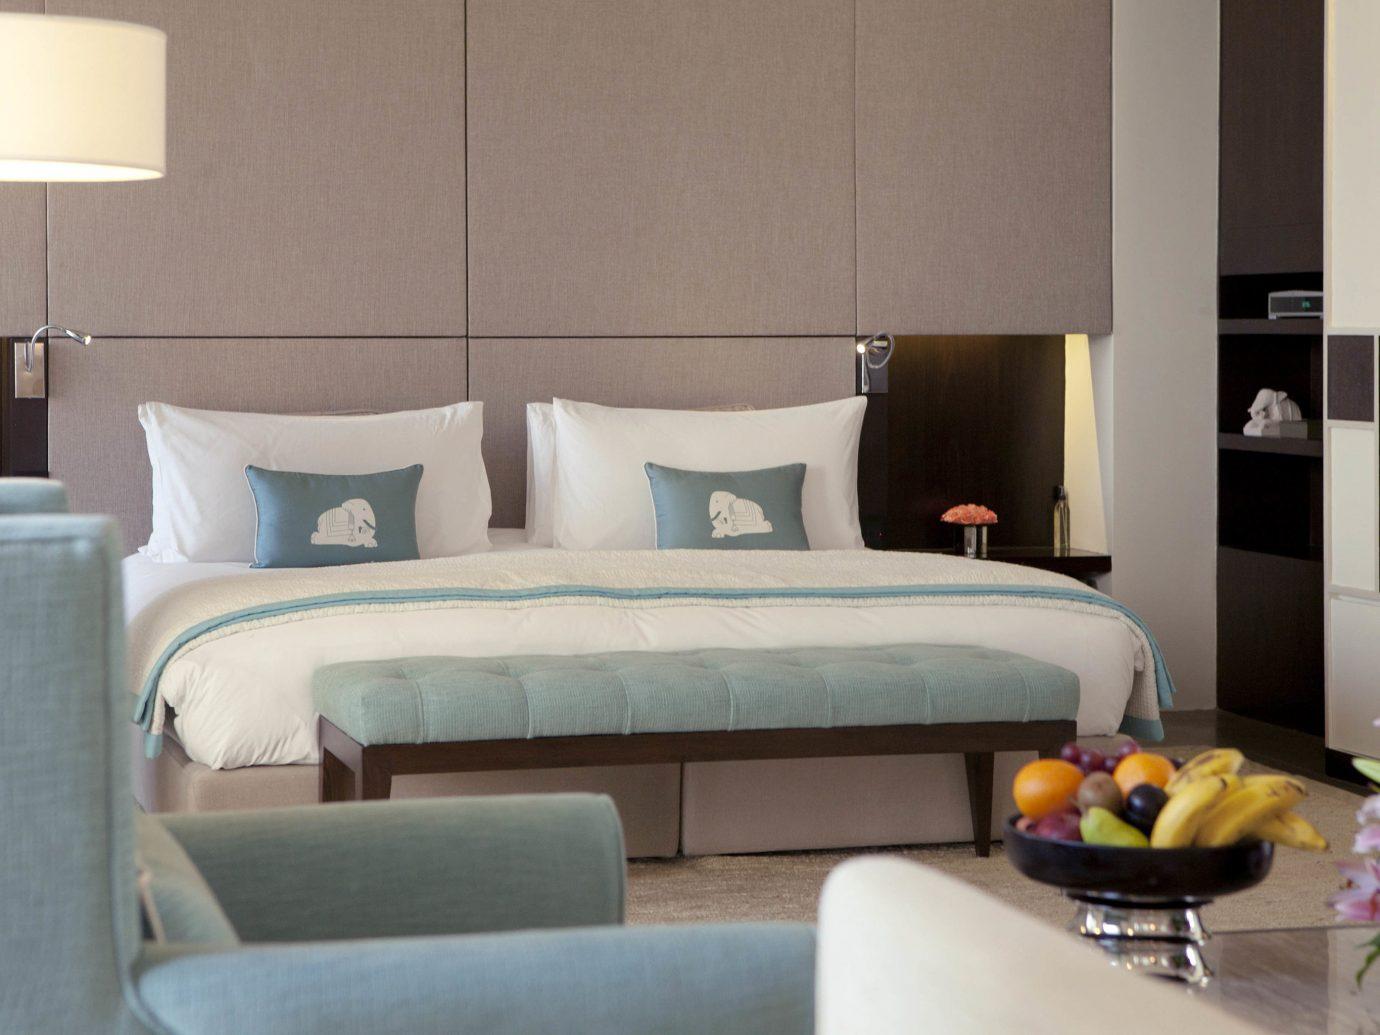 Hotels indoor wall room property living room furniture Bedroom interior design bed Suite bed sheet bed frame hotel studio couch Design apartment Modern